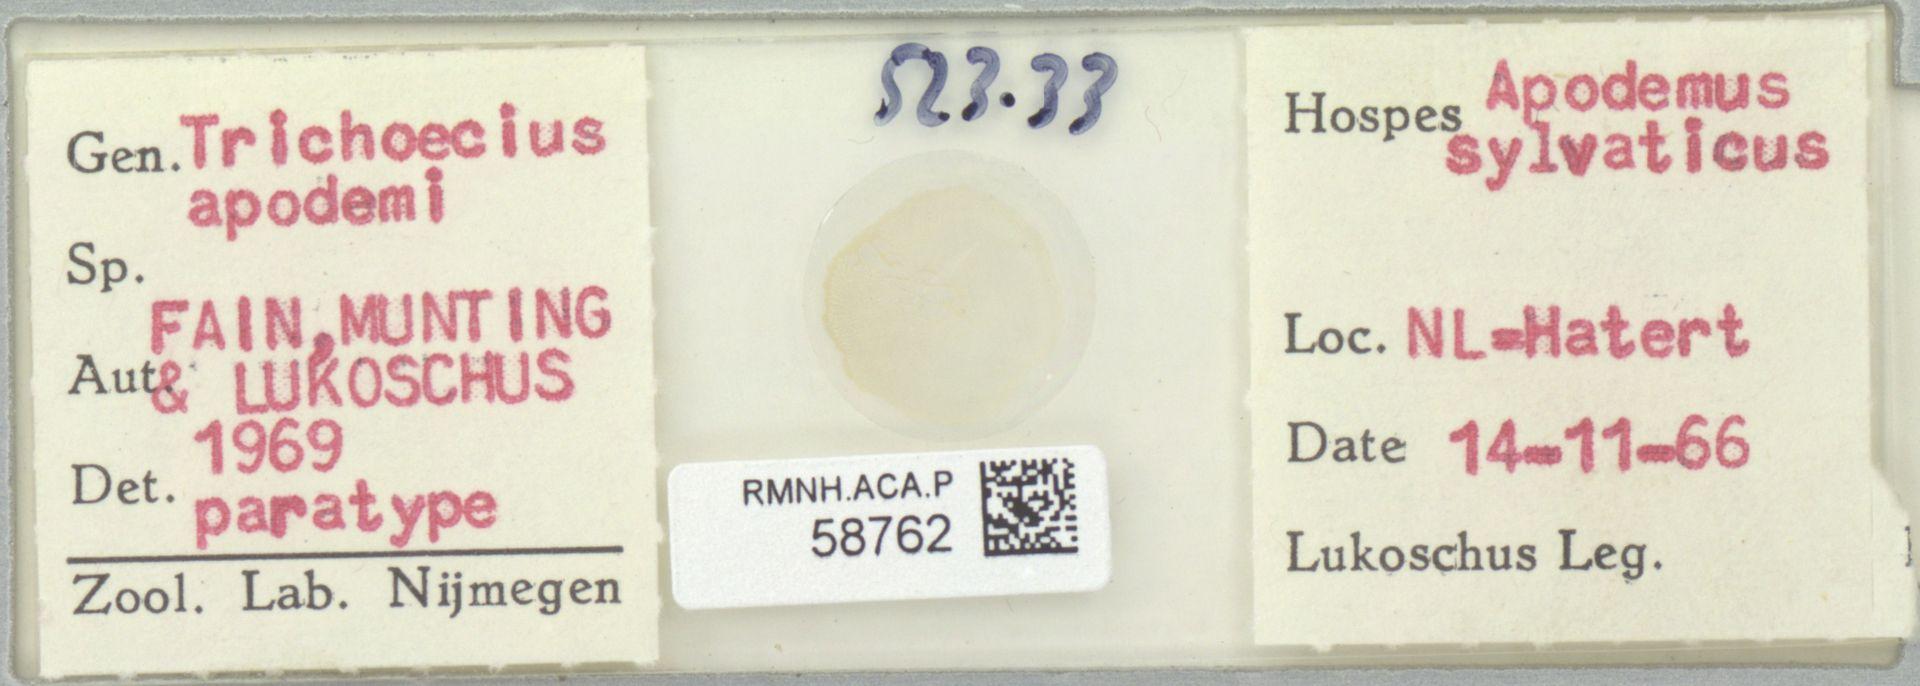 RMNH.ACA.P.58762   Trichoecius apodemi Fain, Munting & Lukoschus 1969